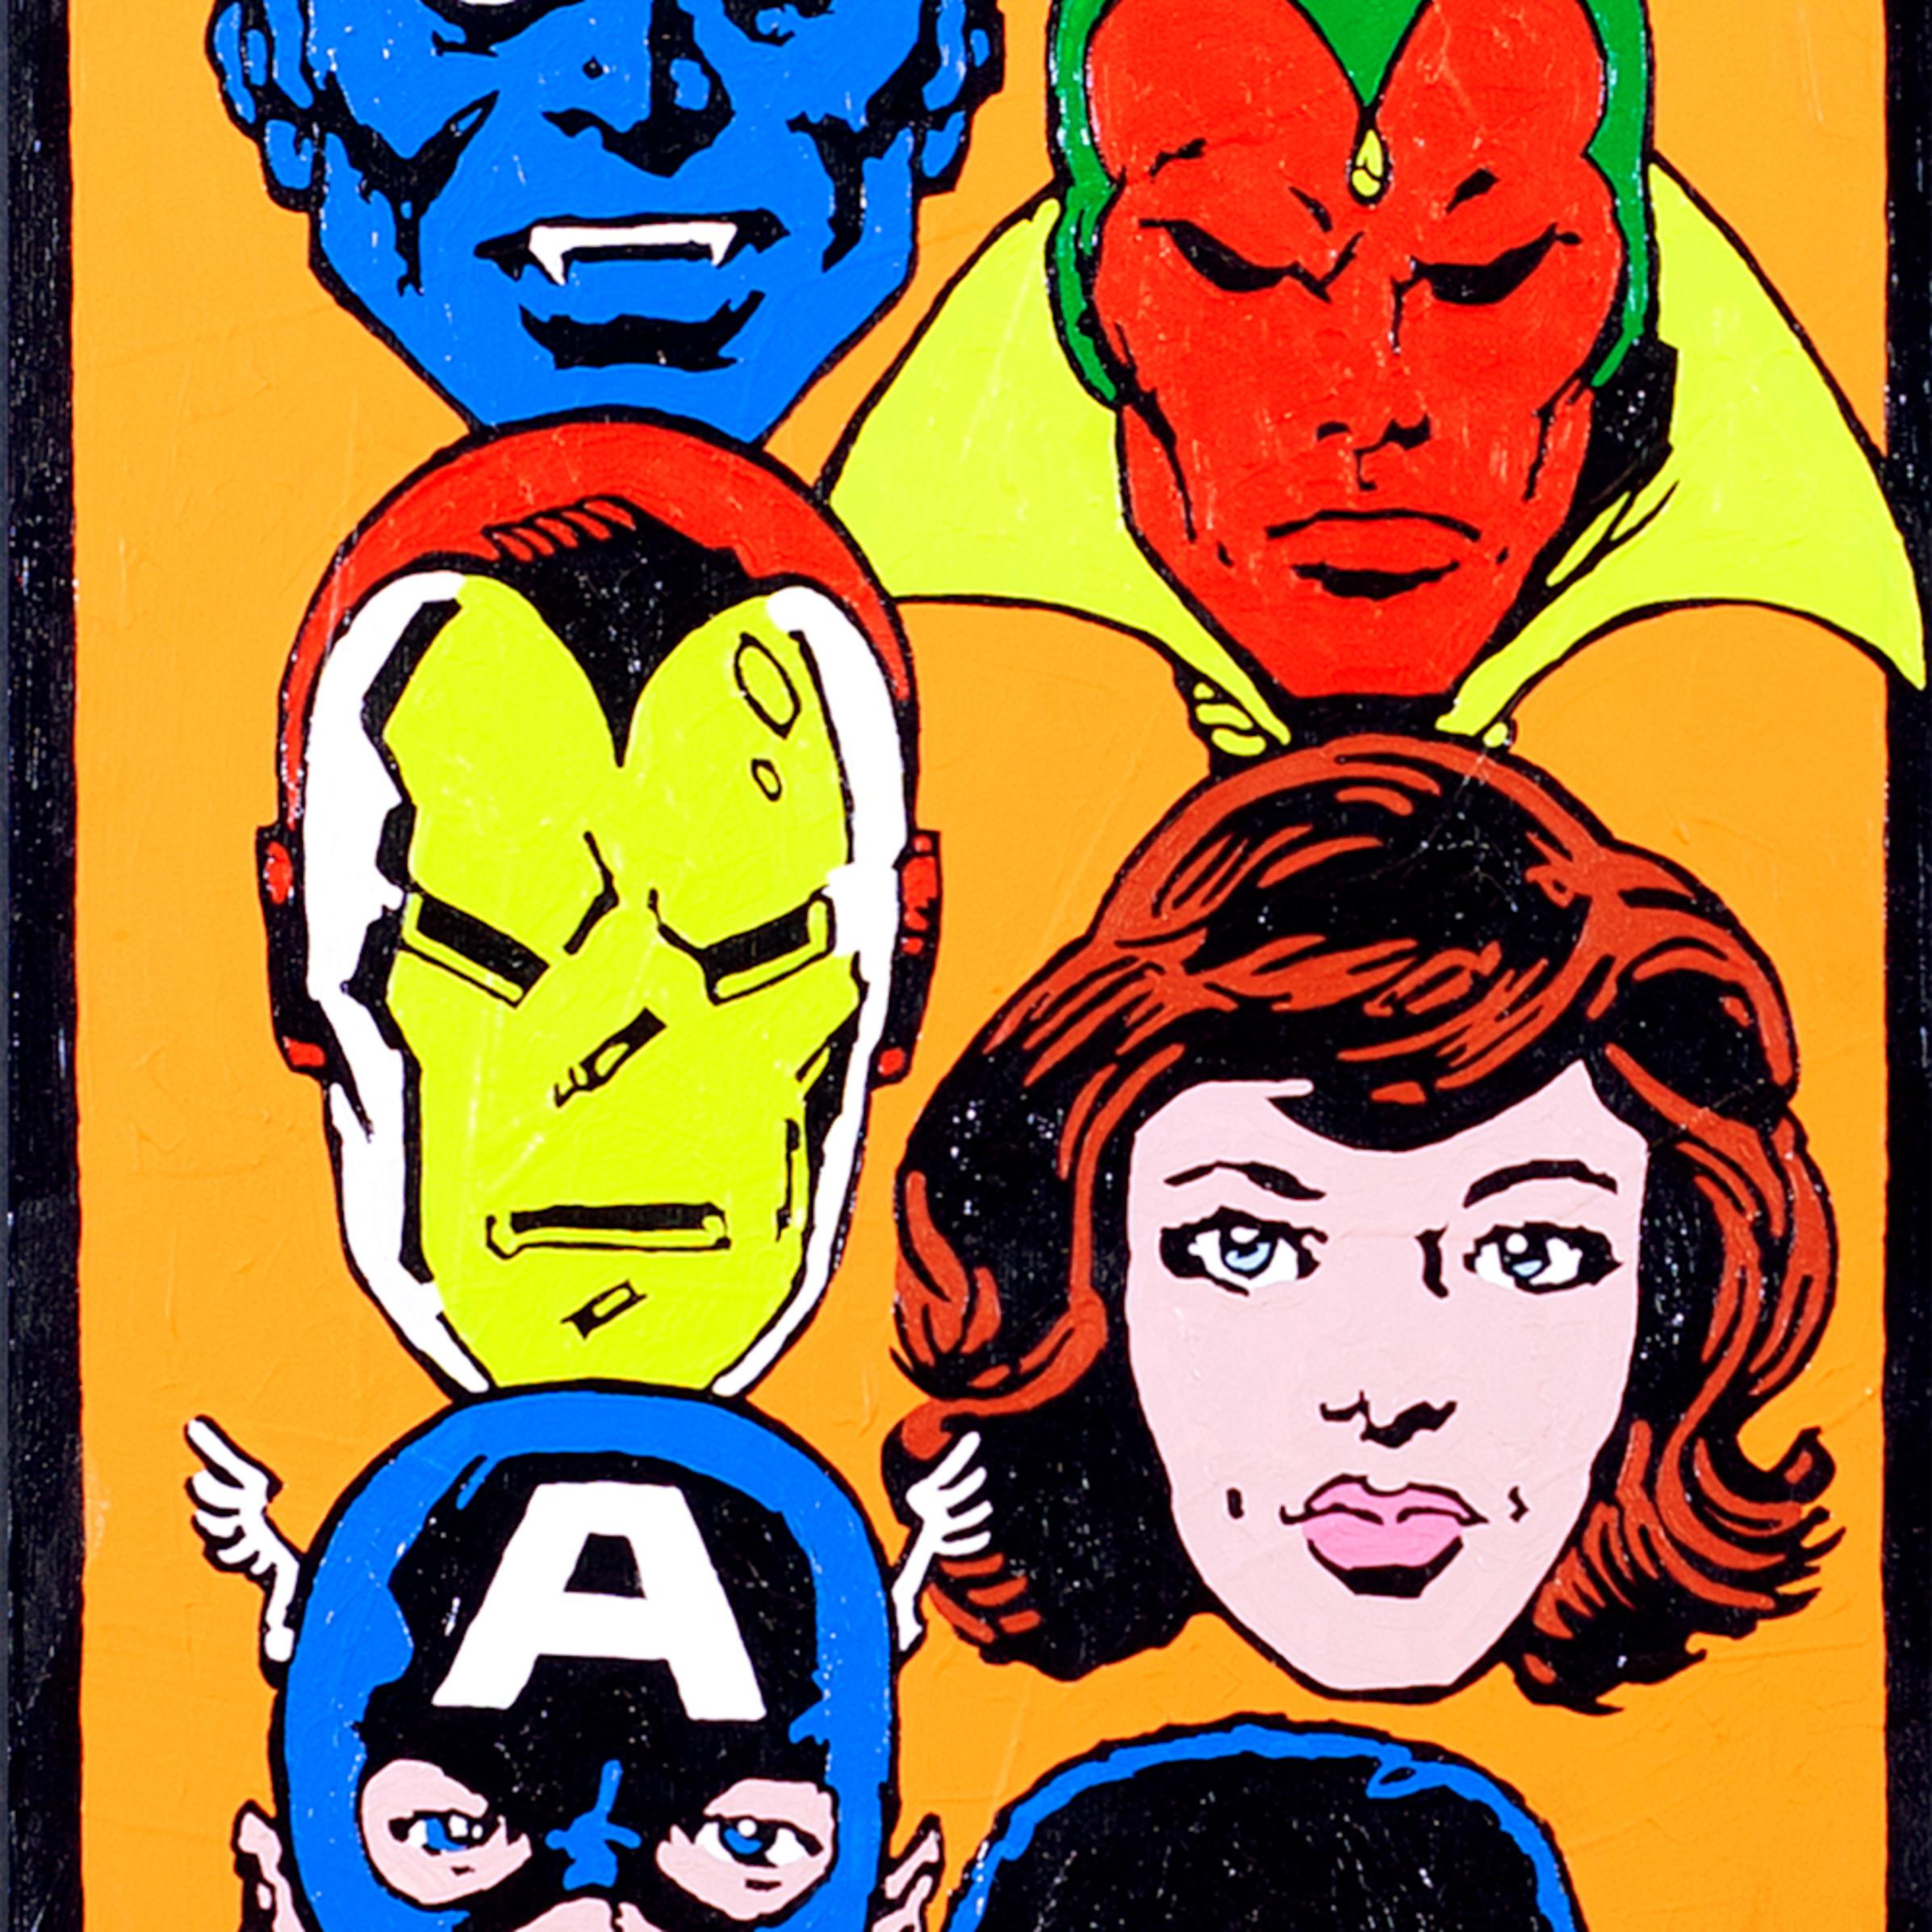 Avengers192 12x36 toddmonk 2020 xl oftc0d